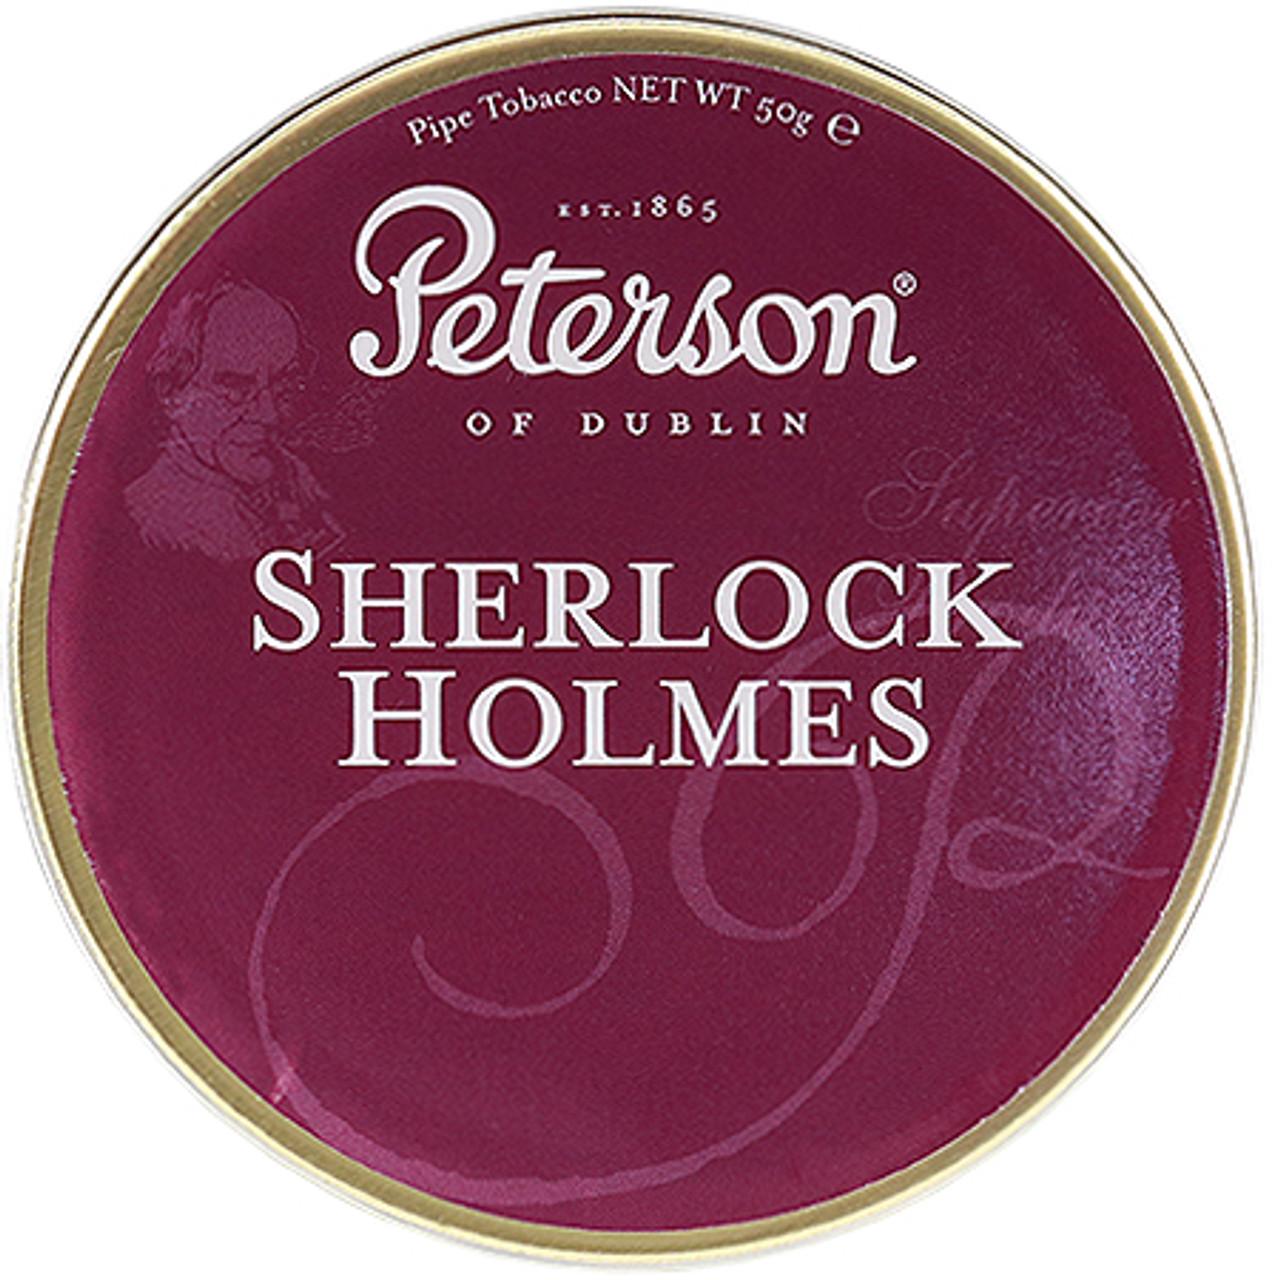 Peterson Sherlock Holmes Pipe Tobacco | 1.75 OZ TIN